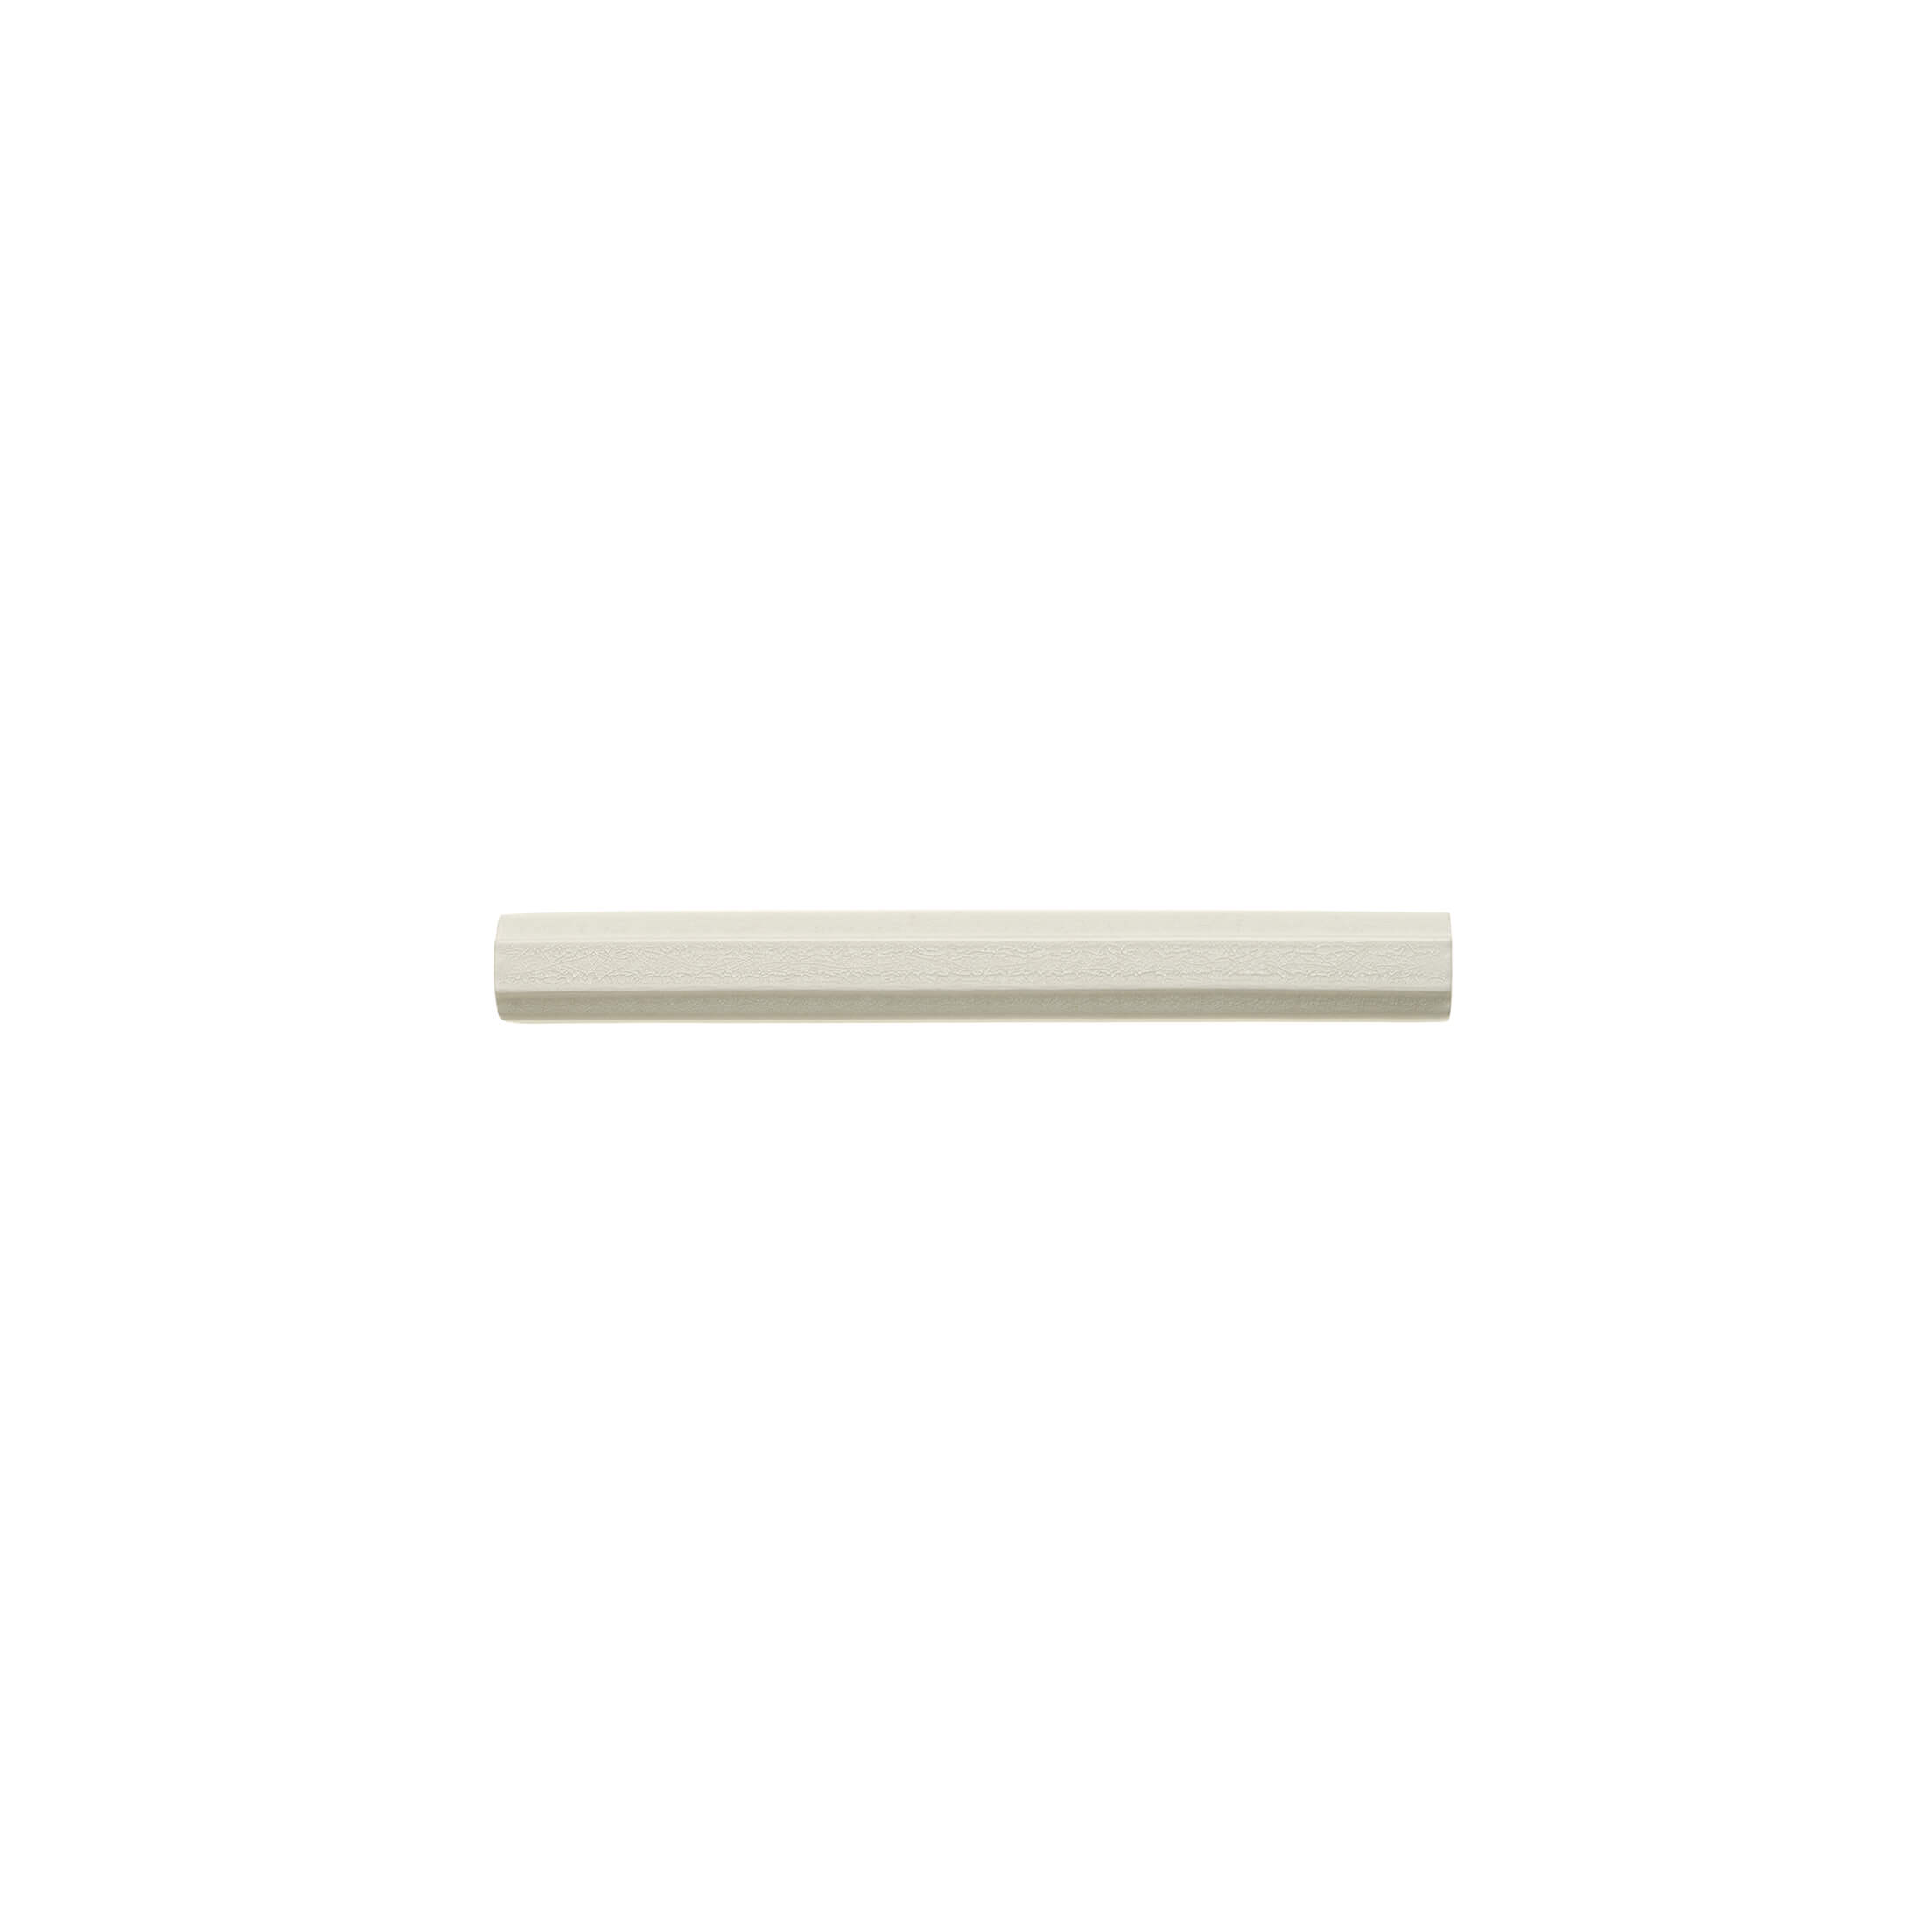 ADOC5044 - LISTELO  - 1.7 cm X 15 cm